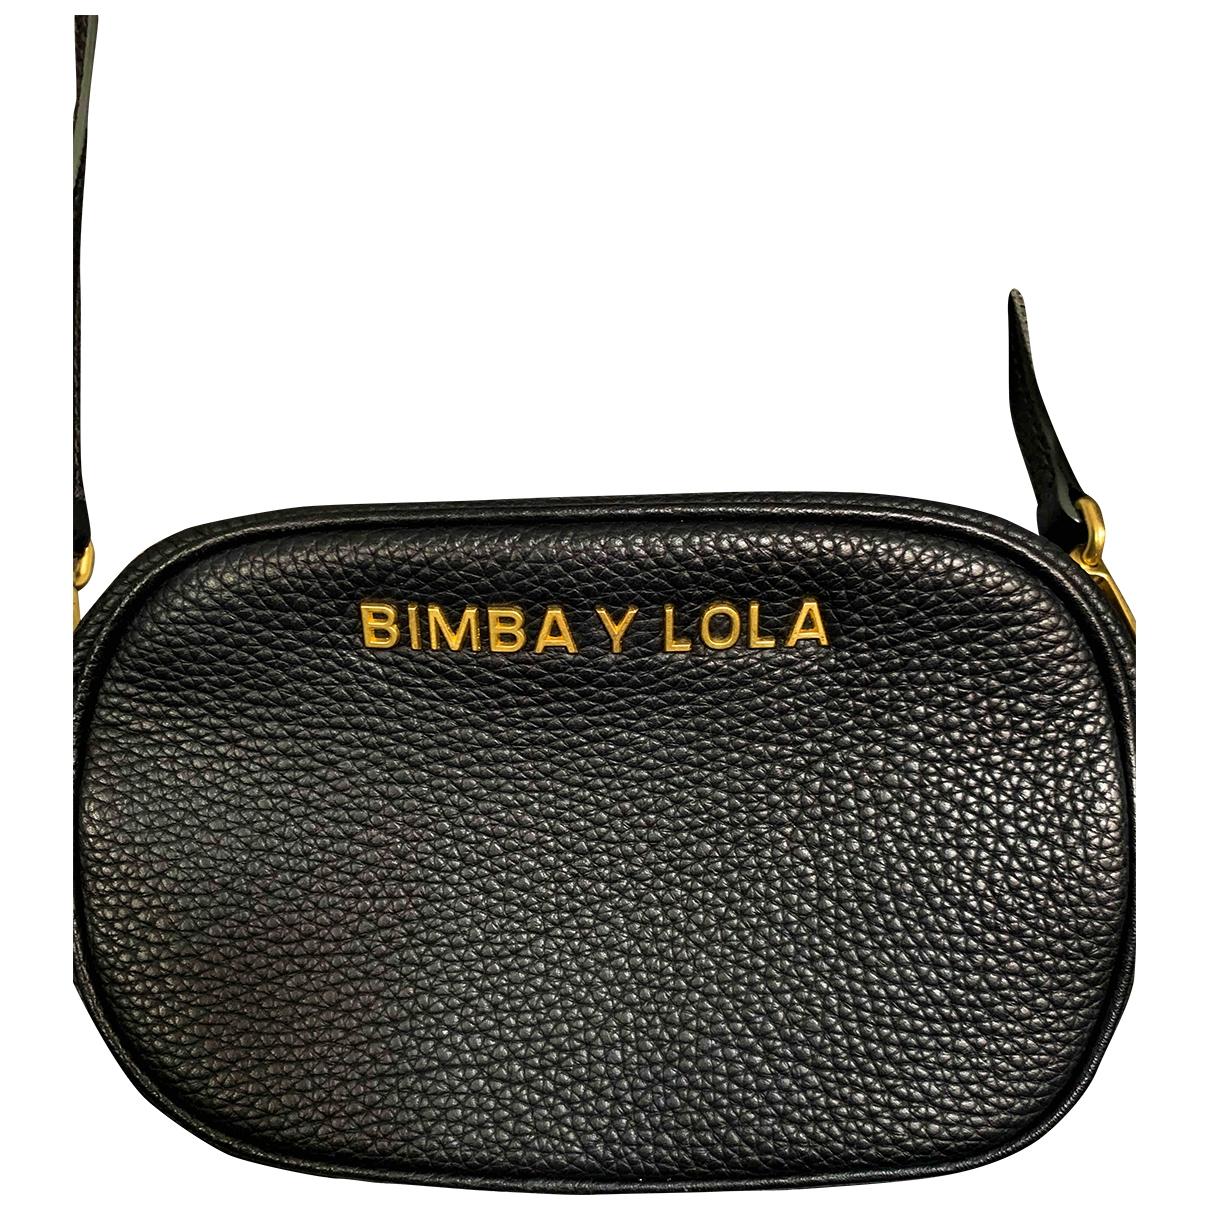 Bimba Y Lola \N Black Leather handbag for Women \N